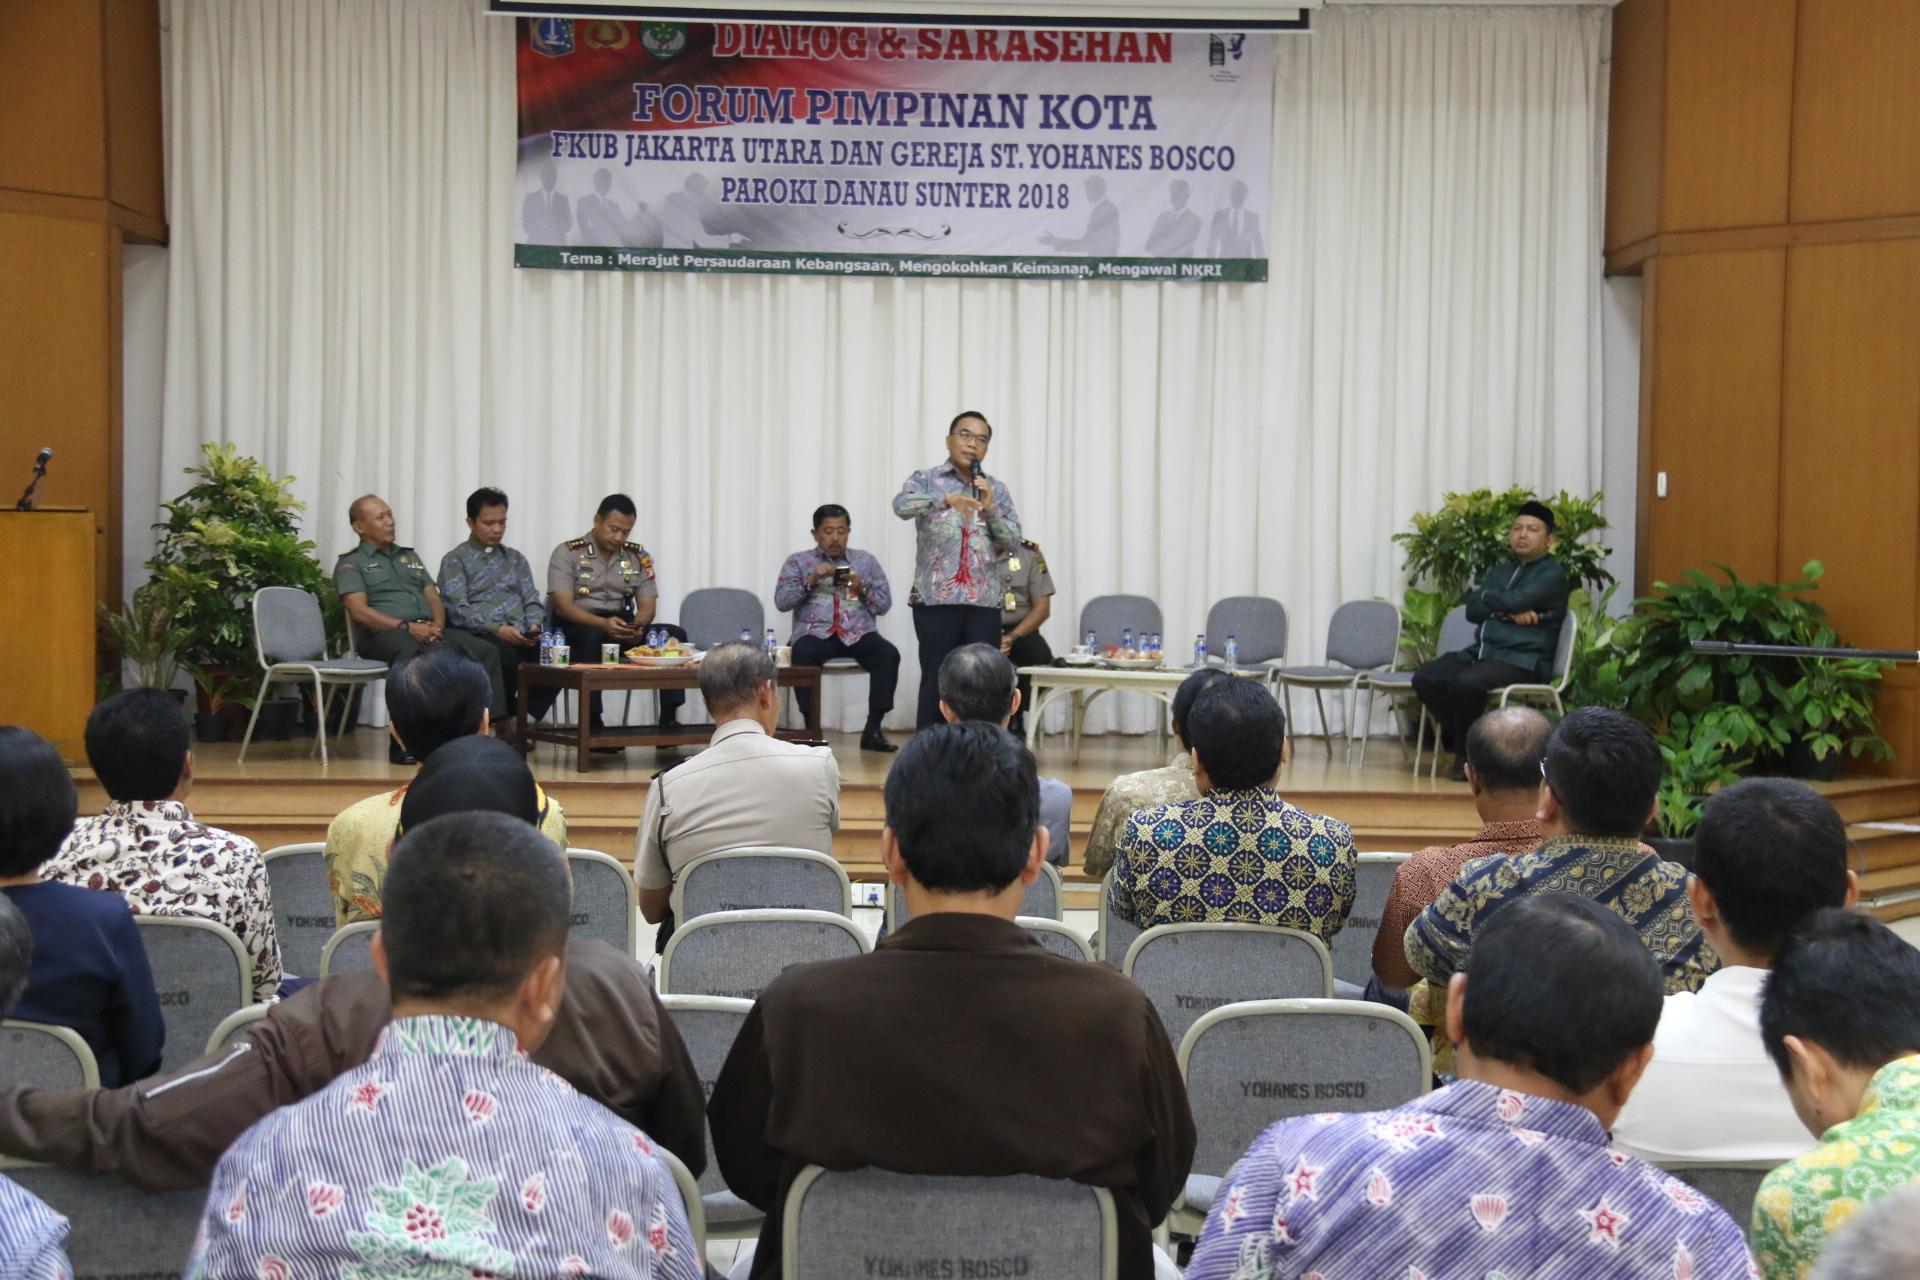 Pemerintah Kota Administrasi Jakarta Utara Walikota Keadilan Buat Umat Kepulauan